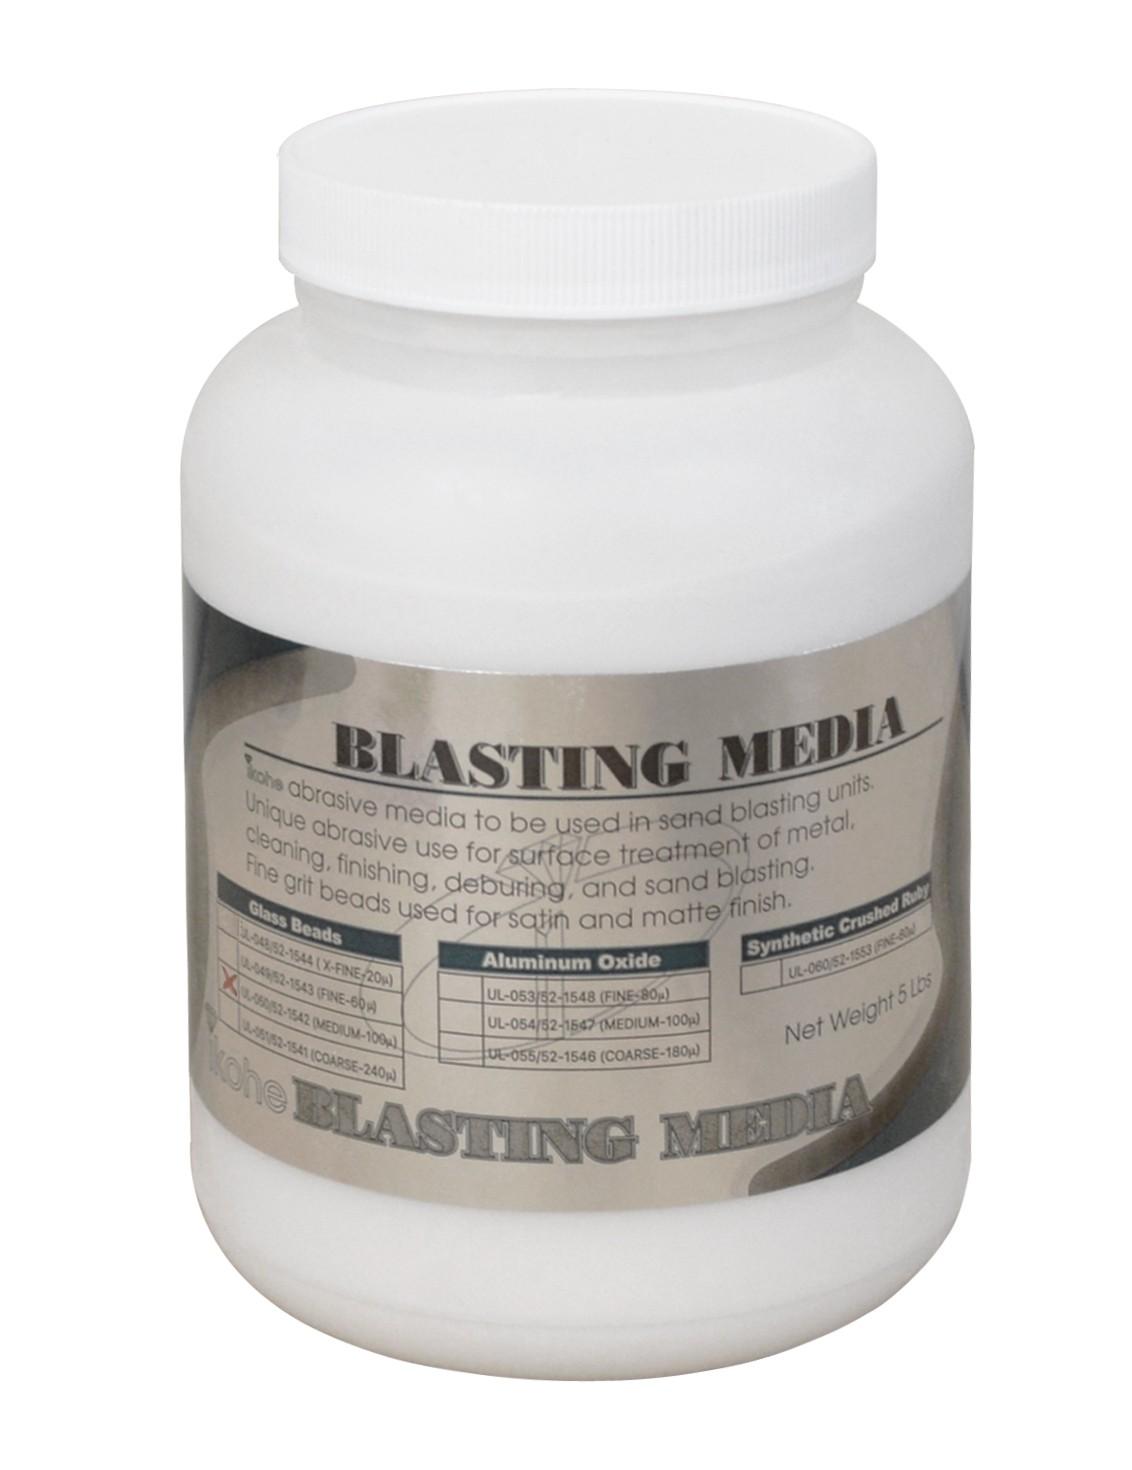 100 Micron Medium Abrasive Glass Beads Blasting Media 5 Lbs 52 1542 Pmc Supplies